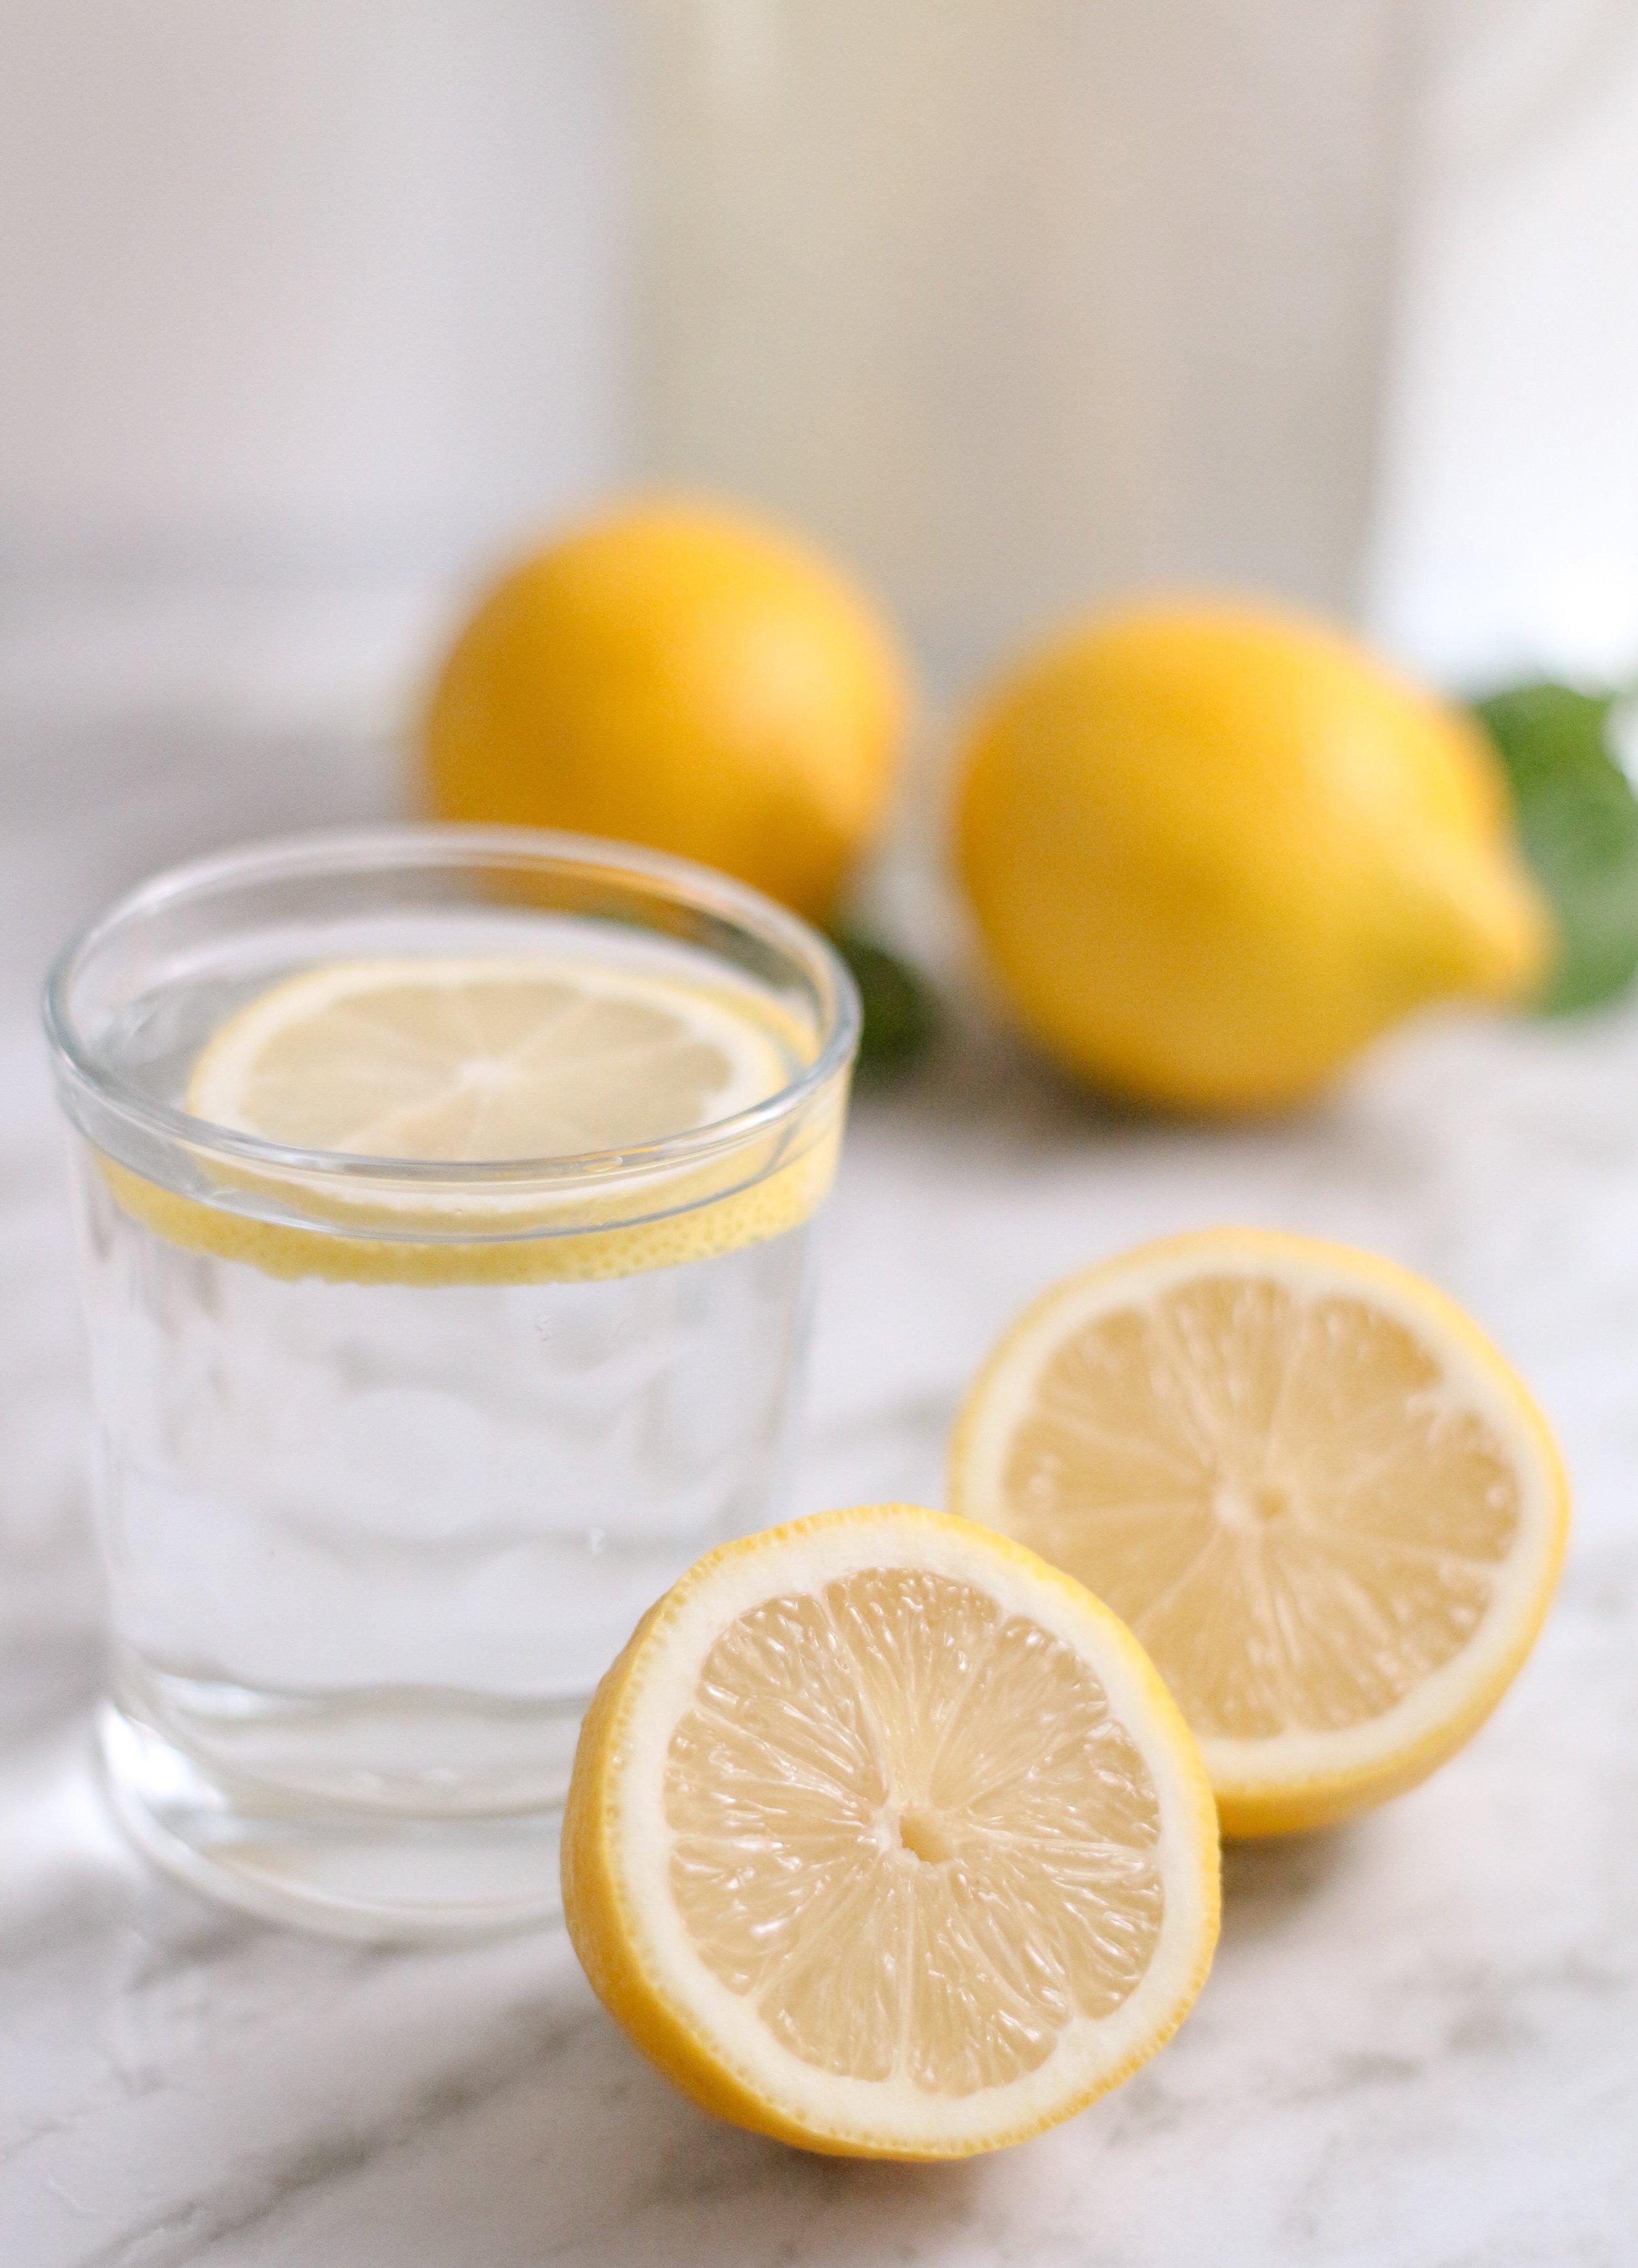 10. Lemon water - Helps boost collagen production